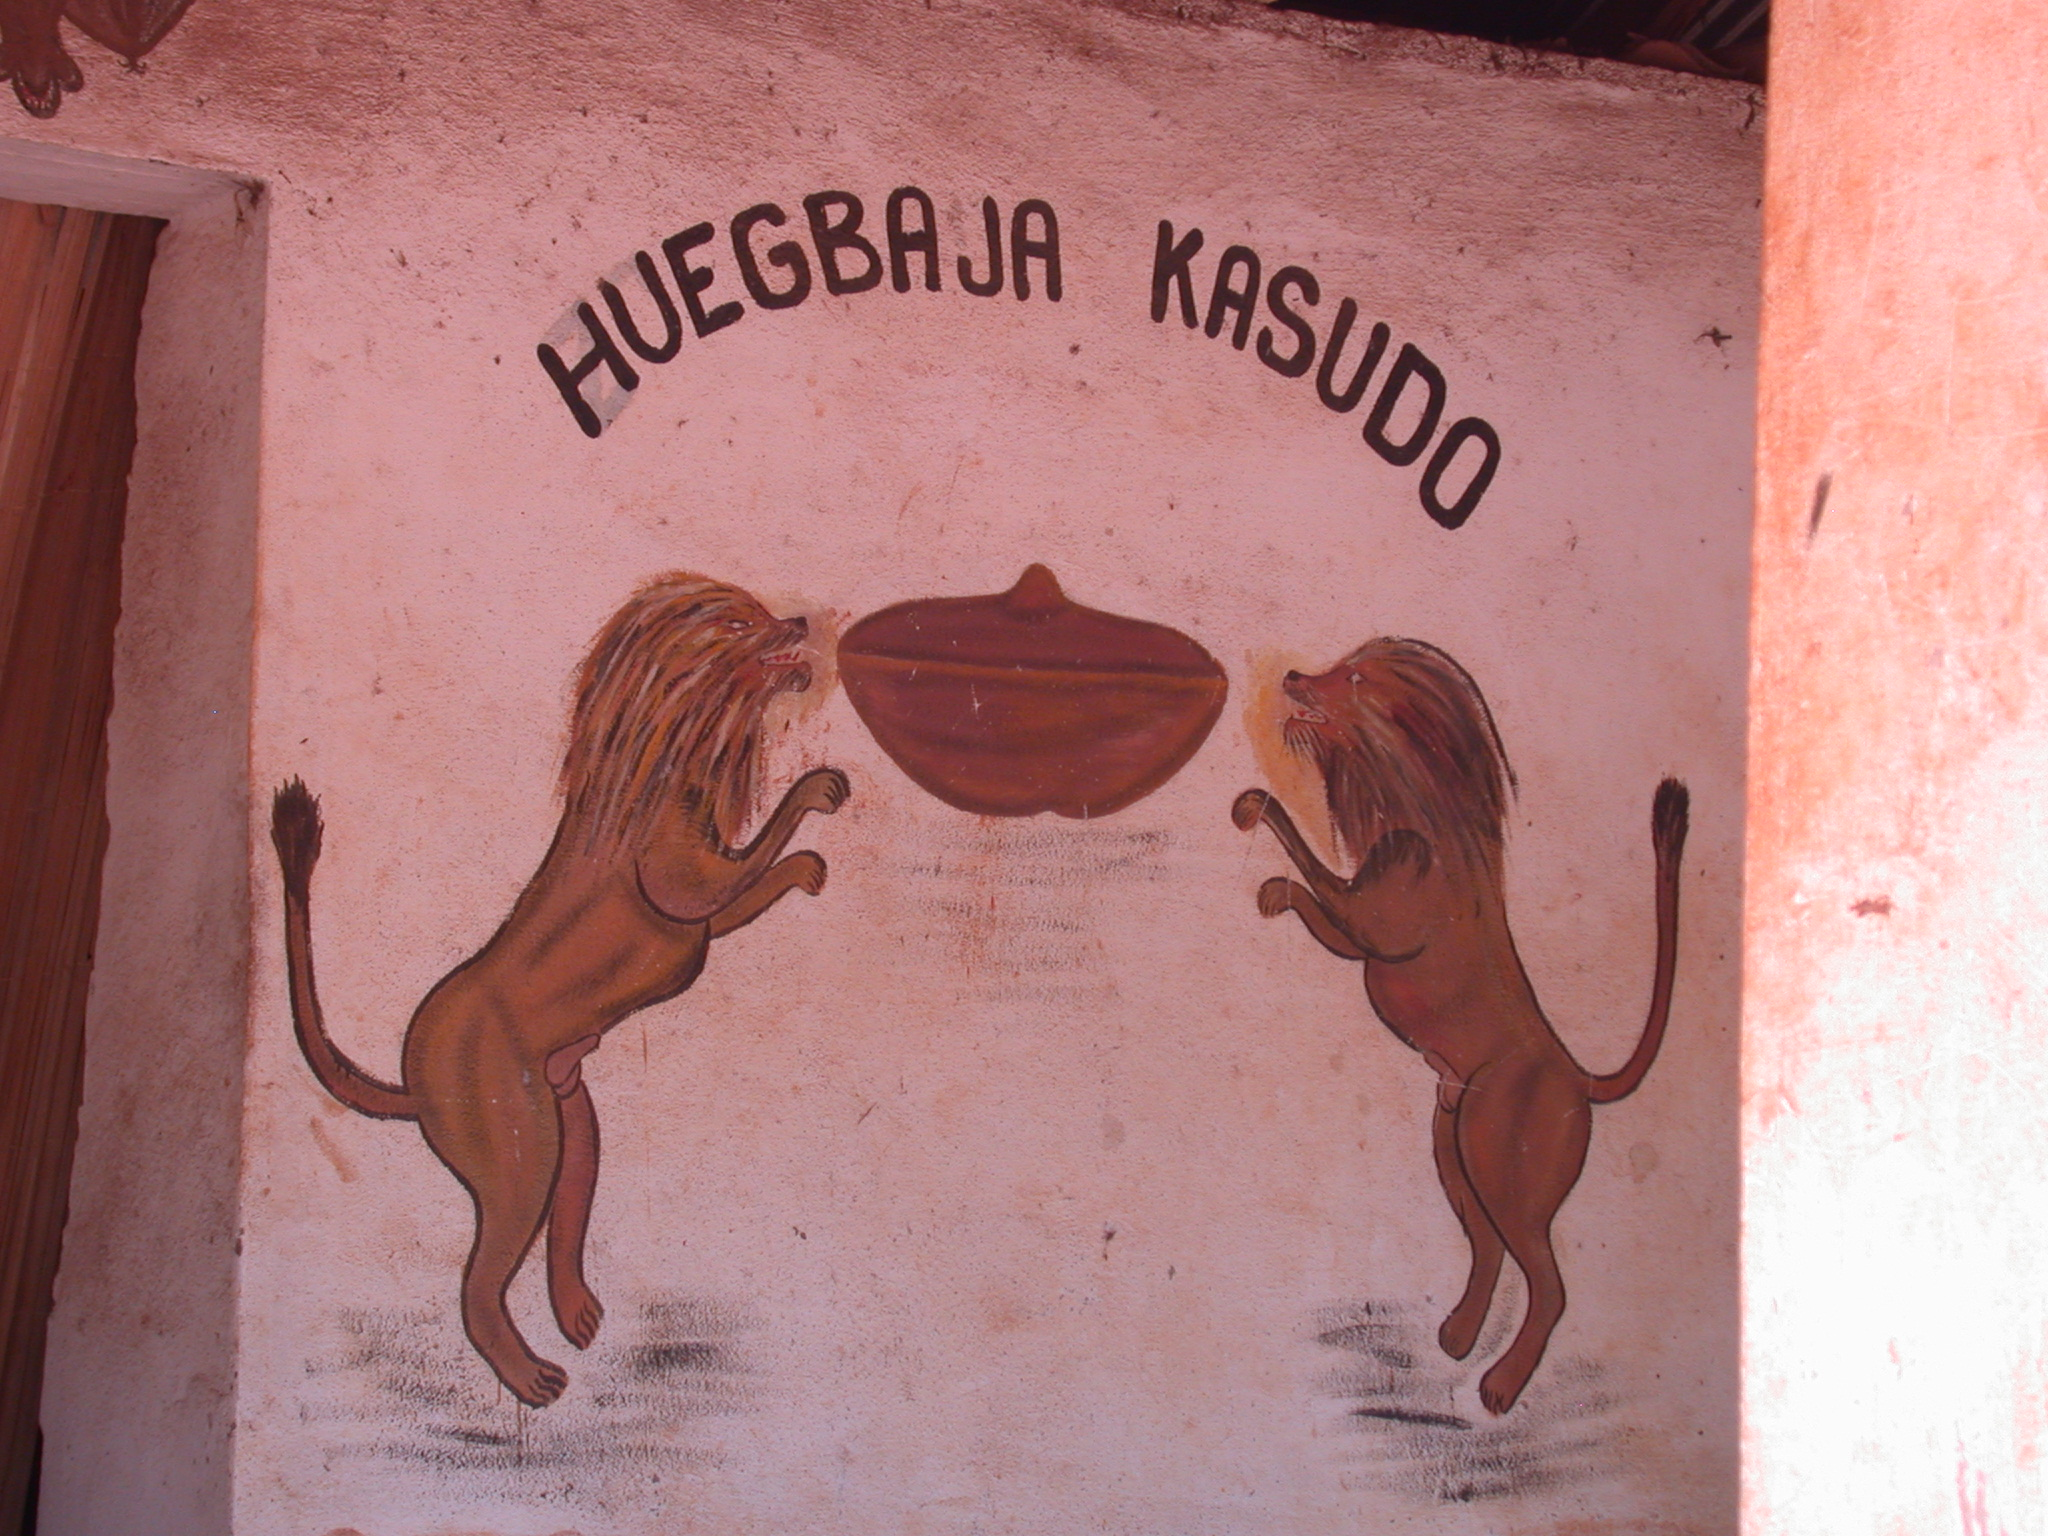 Painting of Huegbaja Kasudo Symbol in Semassou Glele Temple, Abomey, Benin